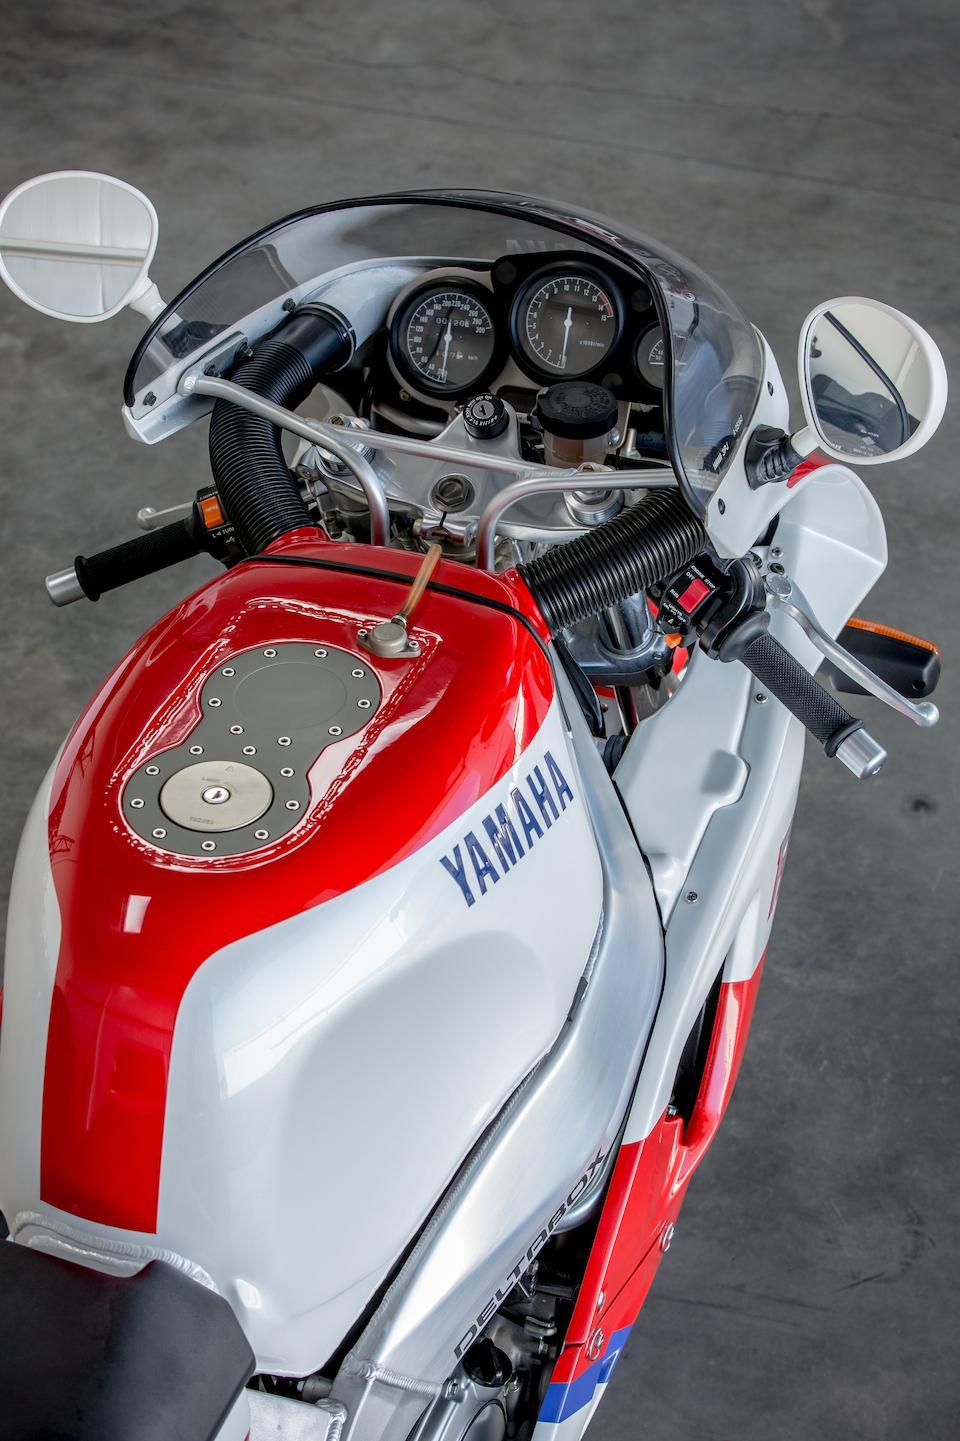 1991 Yamaha FZR 750RT OW01 Frame no. 35J-002145 Engine no. to be advised